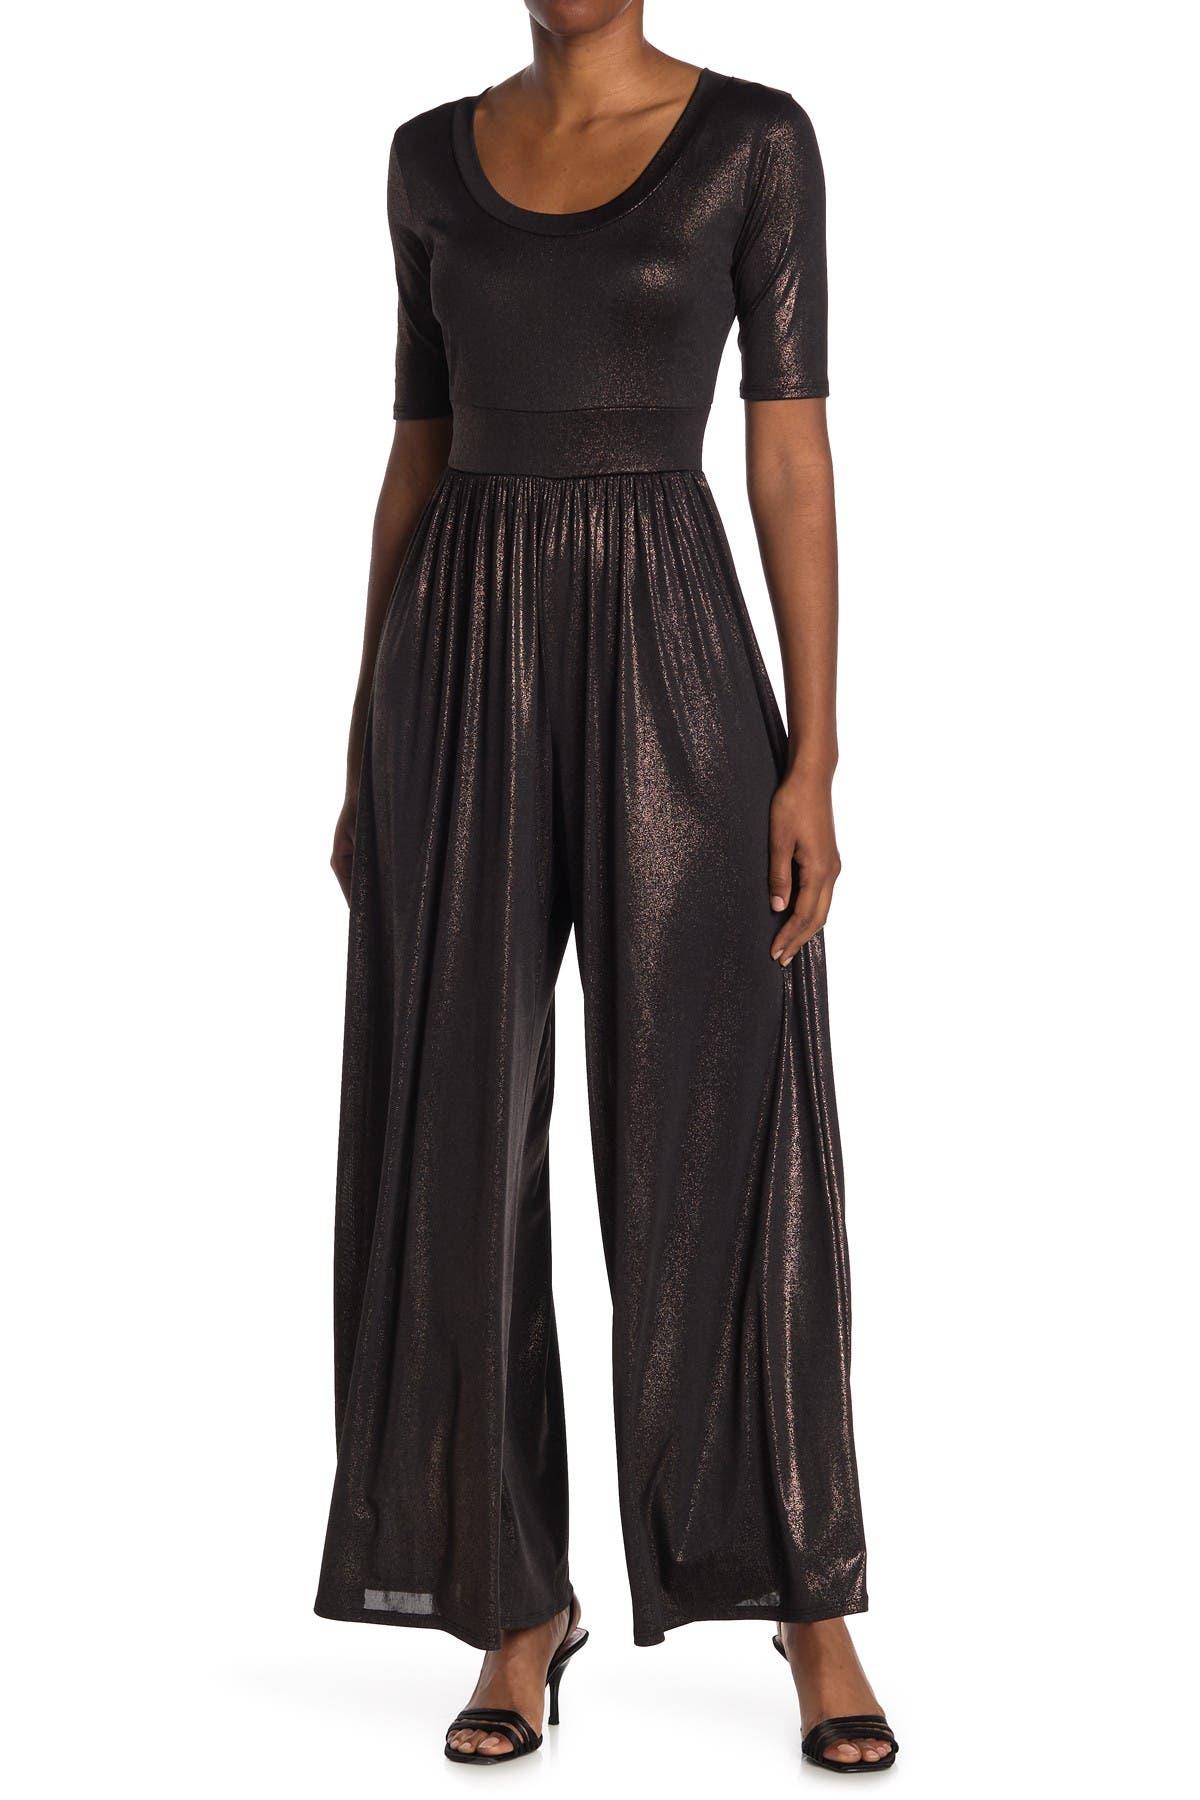 Image of WEST KEI Metallic Knit Scoop Neck Jumpsuit